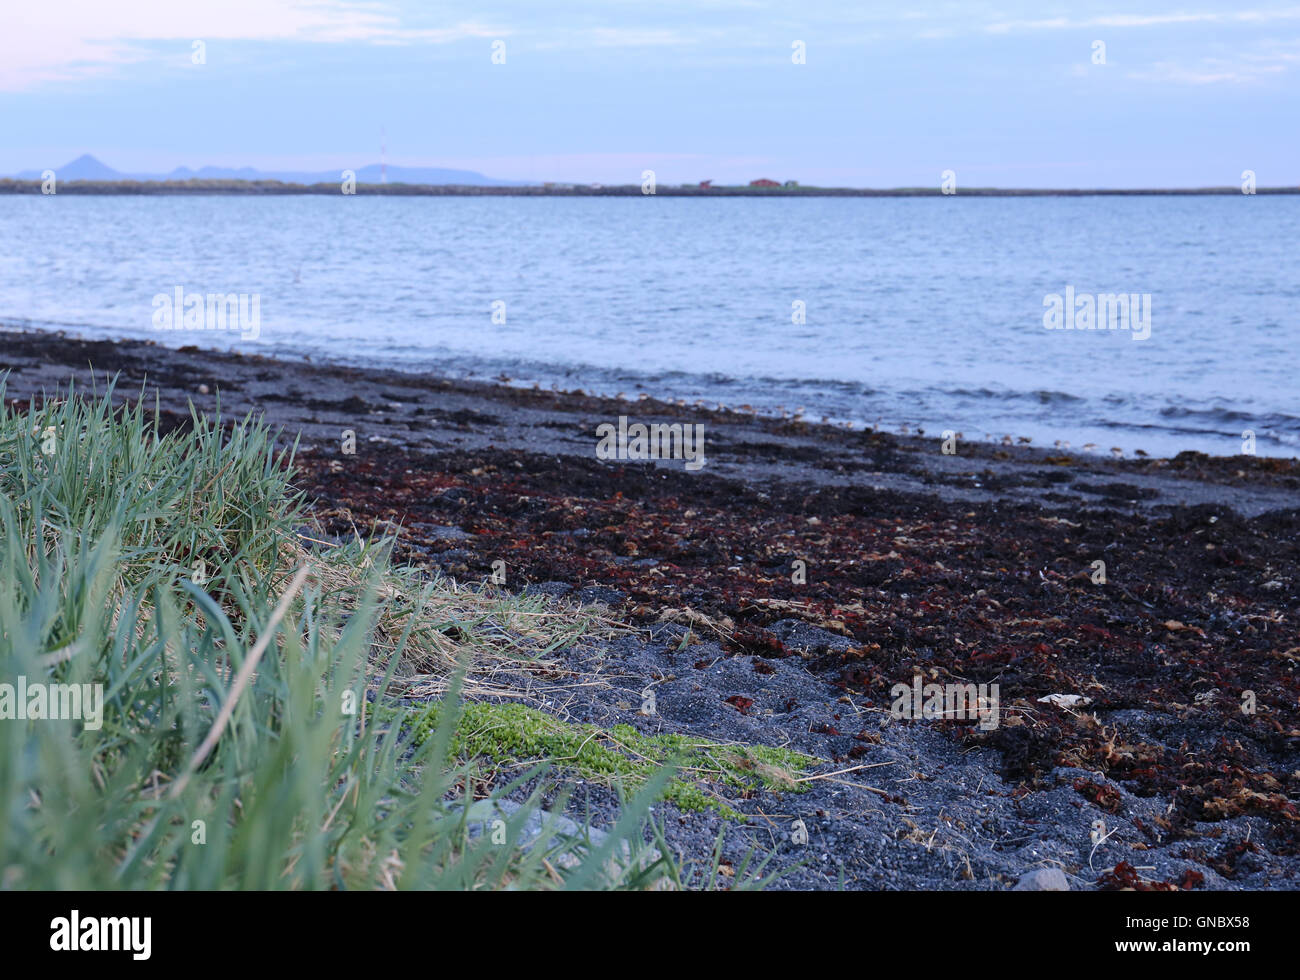 Icelandic blue hour, Iceland in summertime - Stock Image